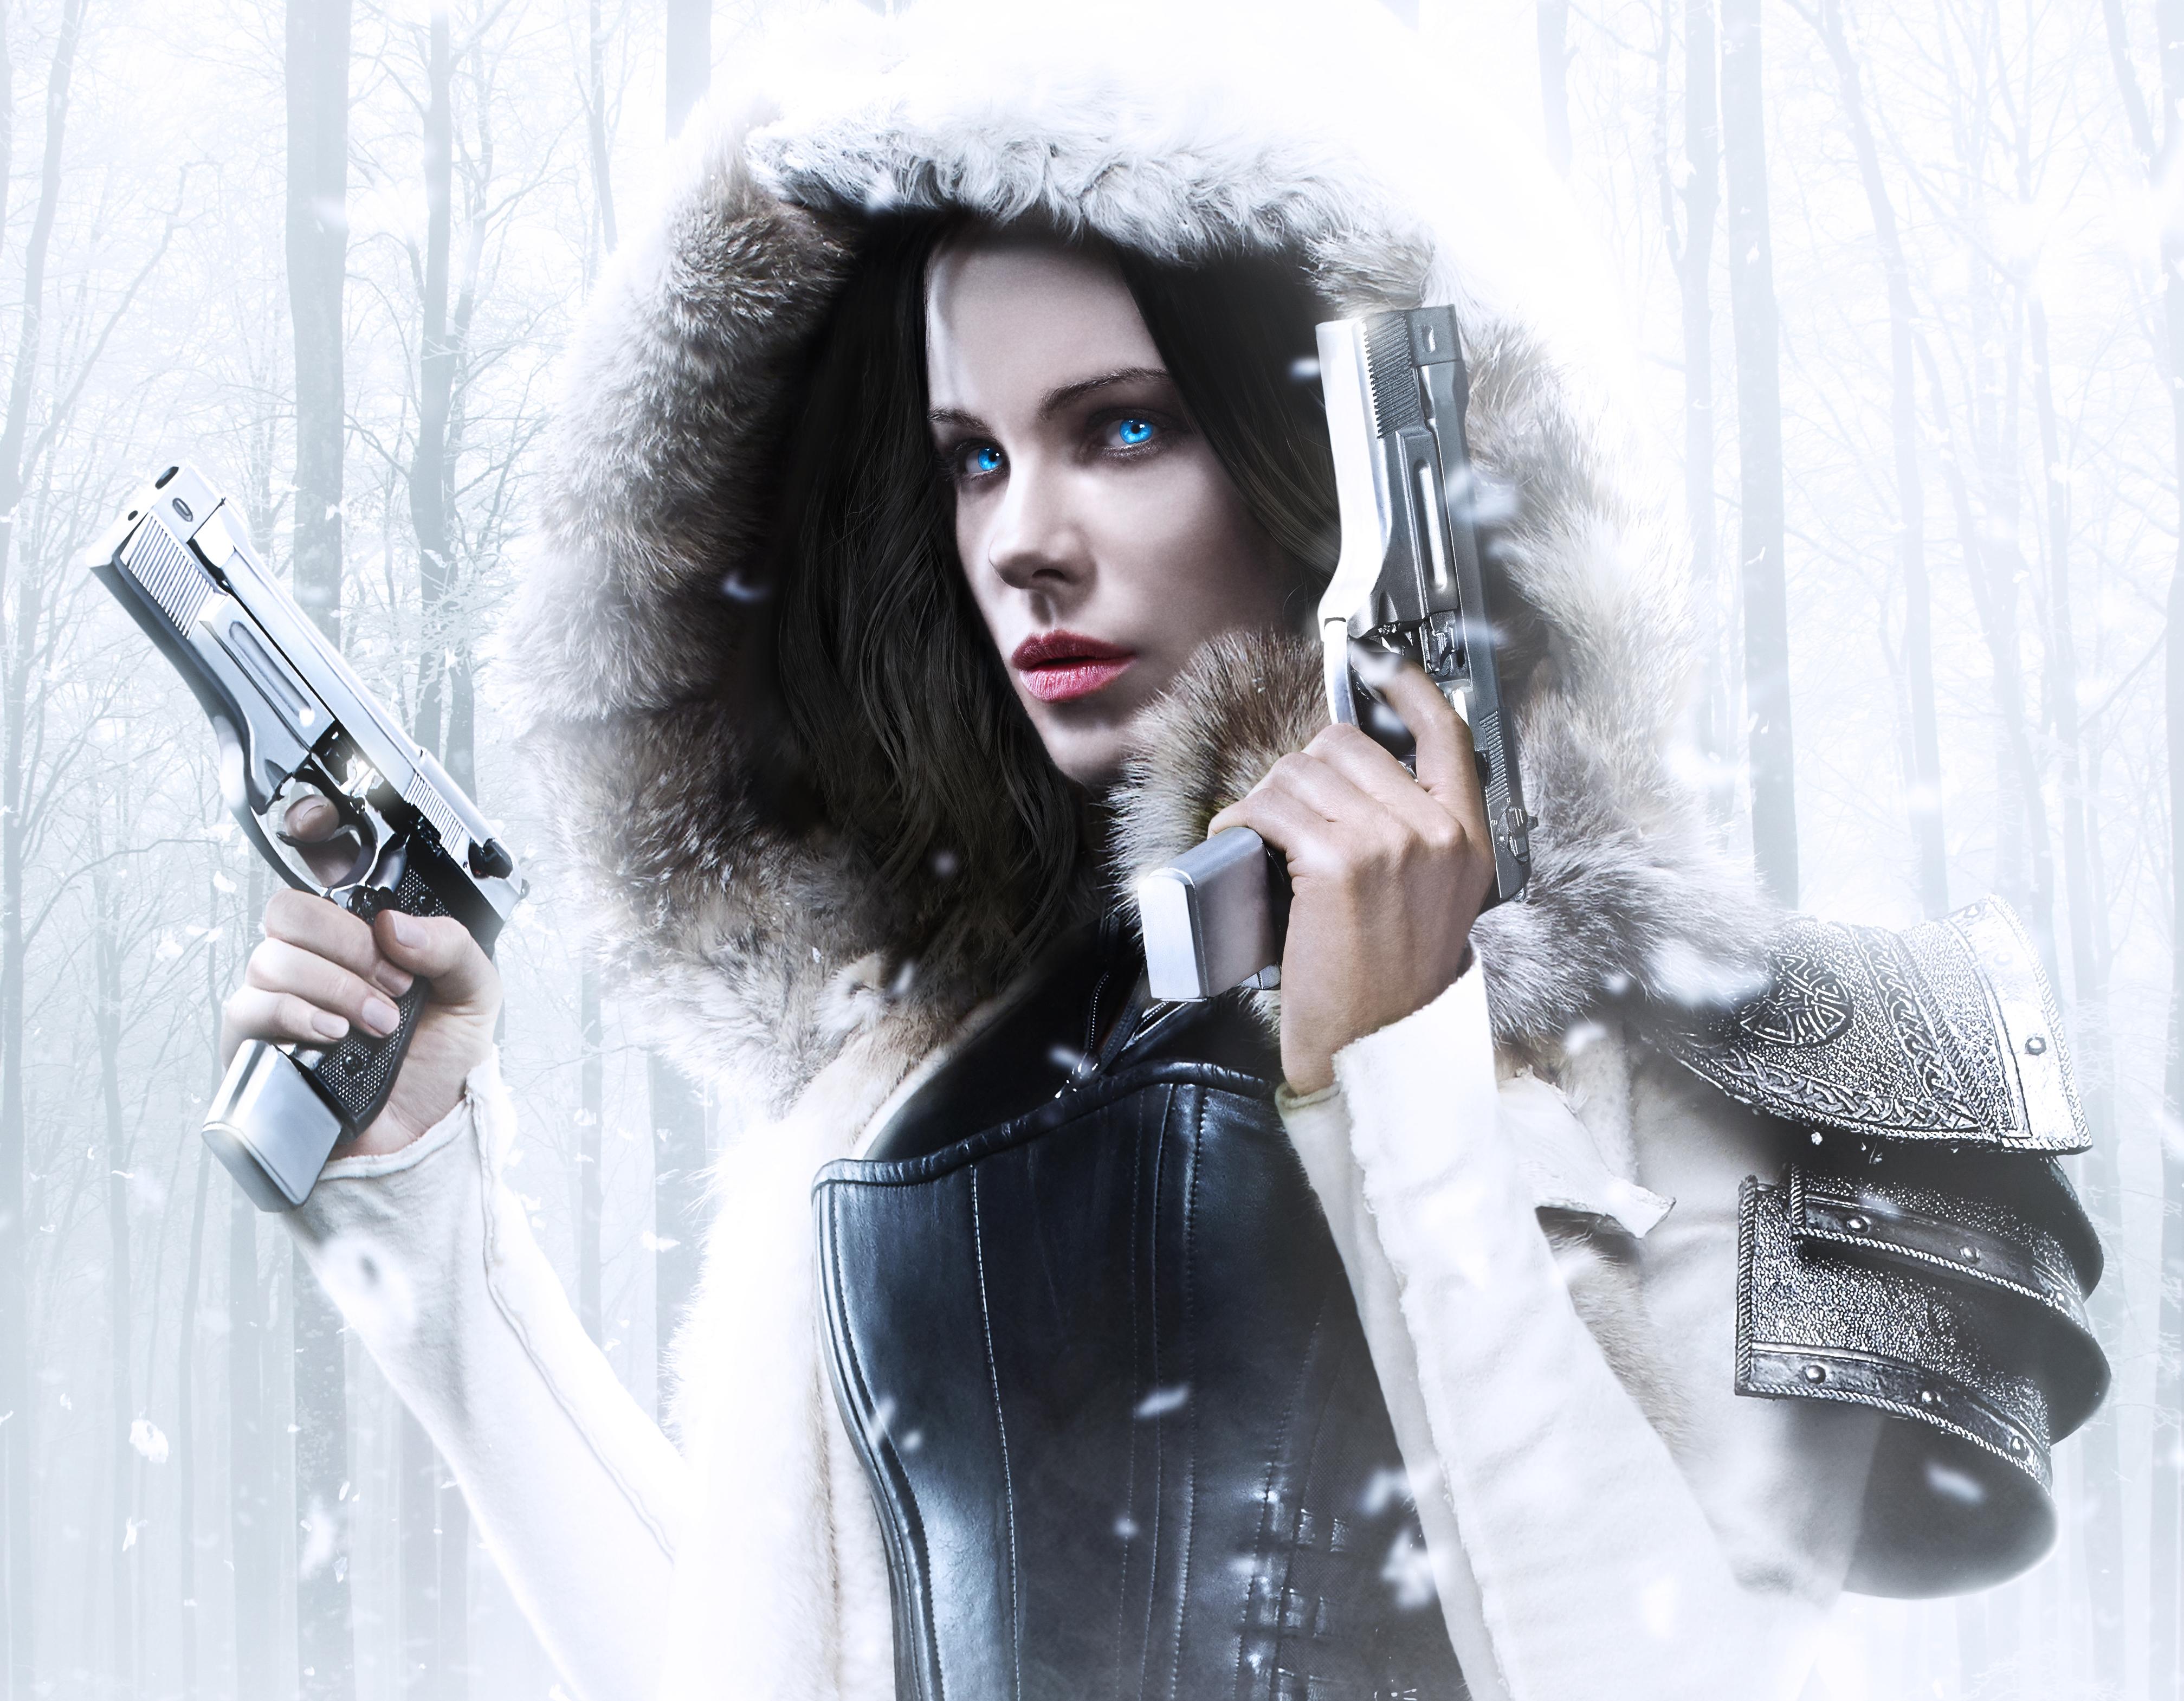 NYCC: New 'Underworld: Blood Wars' Trailer, All Bloodlines Must End